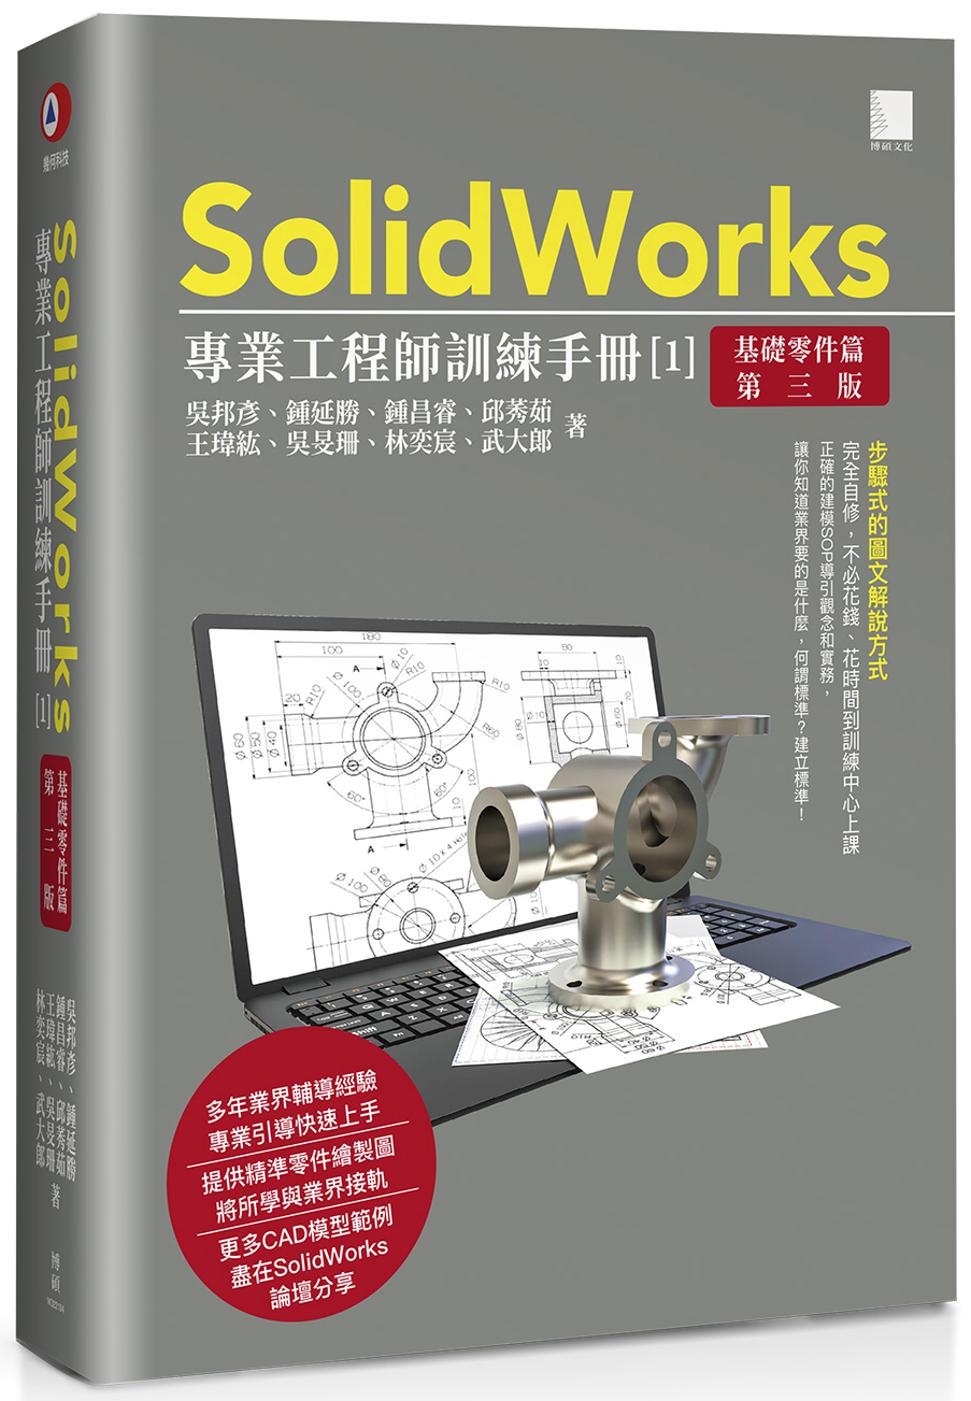 SolidWorks專業工程師...